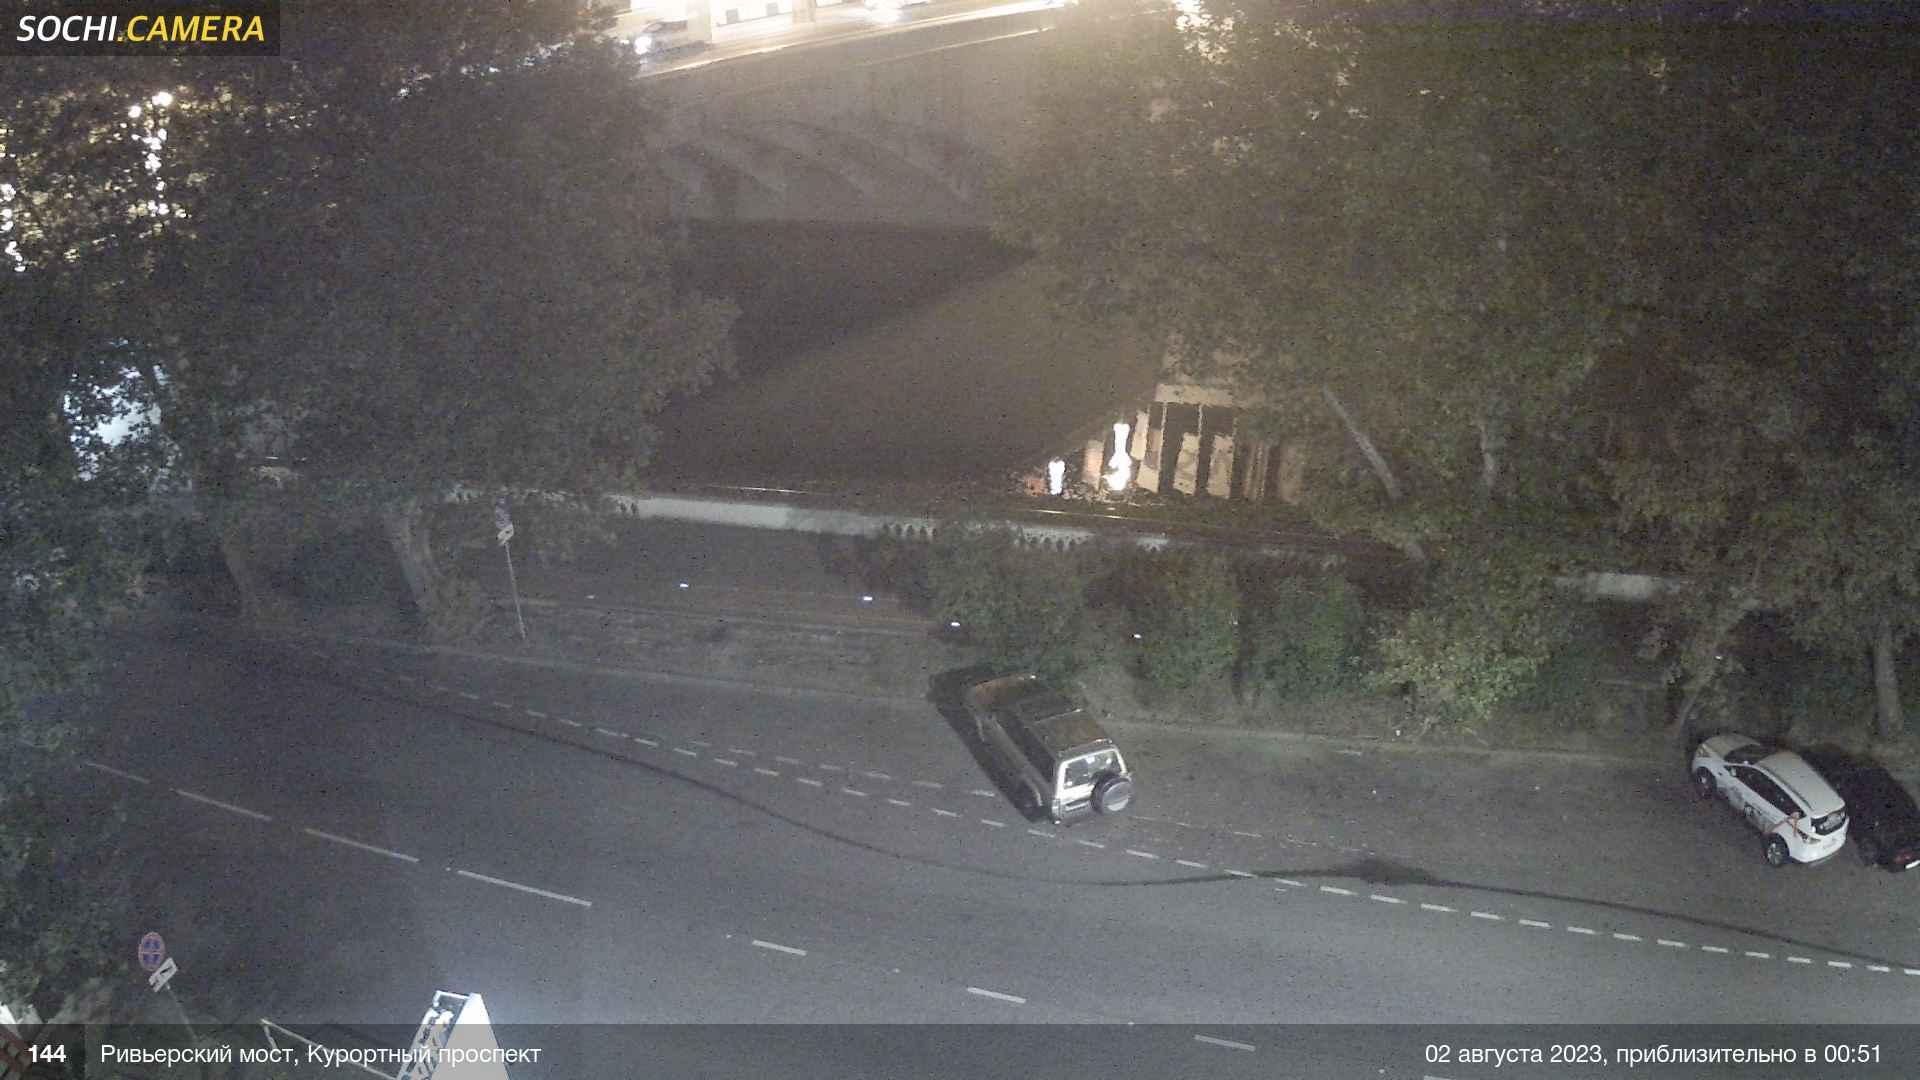 Webkamera Sochi: Ривьерский мост г